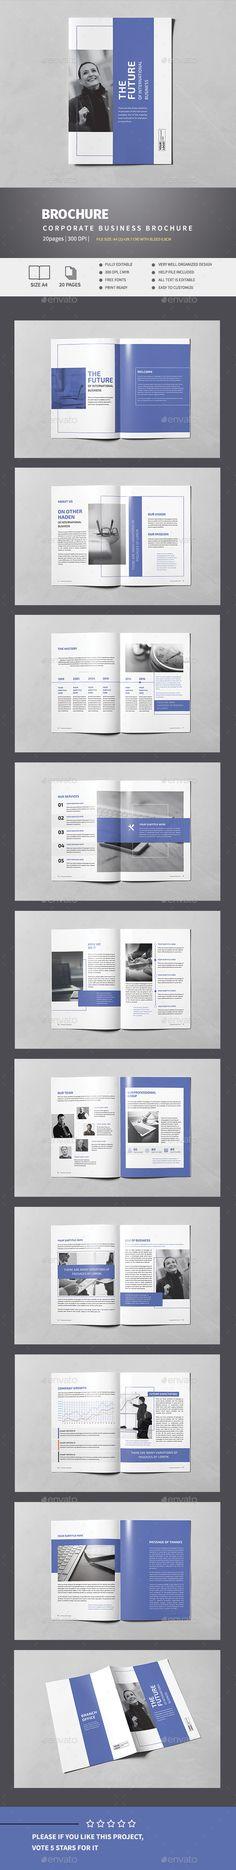 Indigo Business Brochure Template InDesign INDD. Download here: http://graphicriver.net/item/indigo-business-brochure/15066765?ref=ksioks